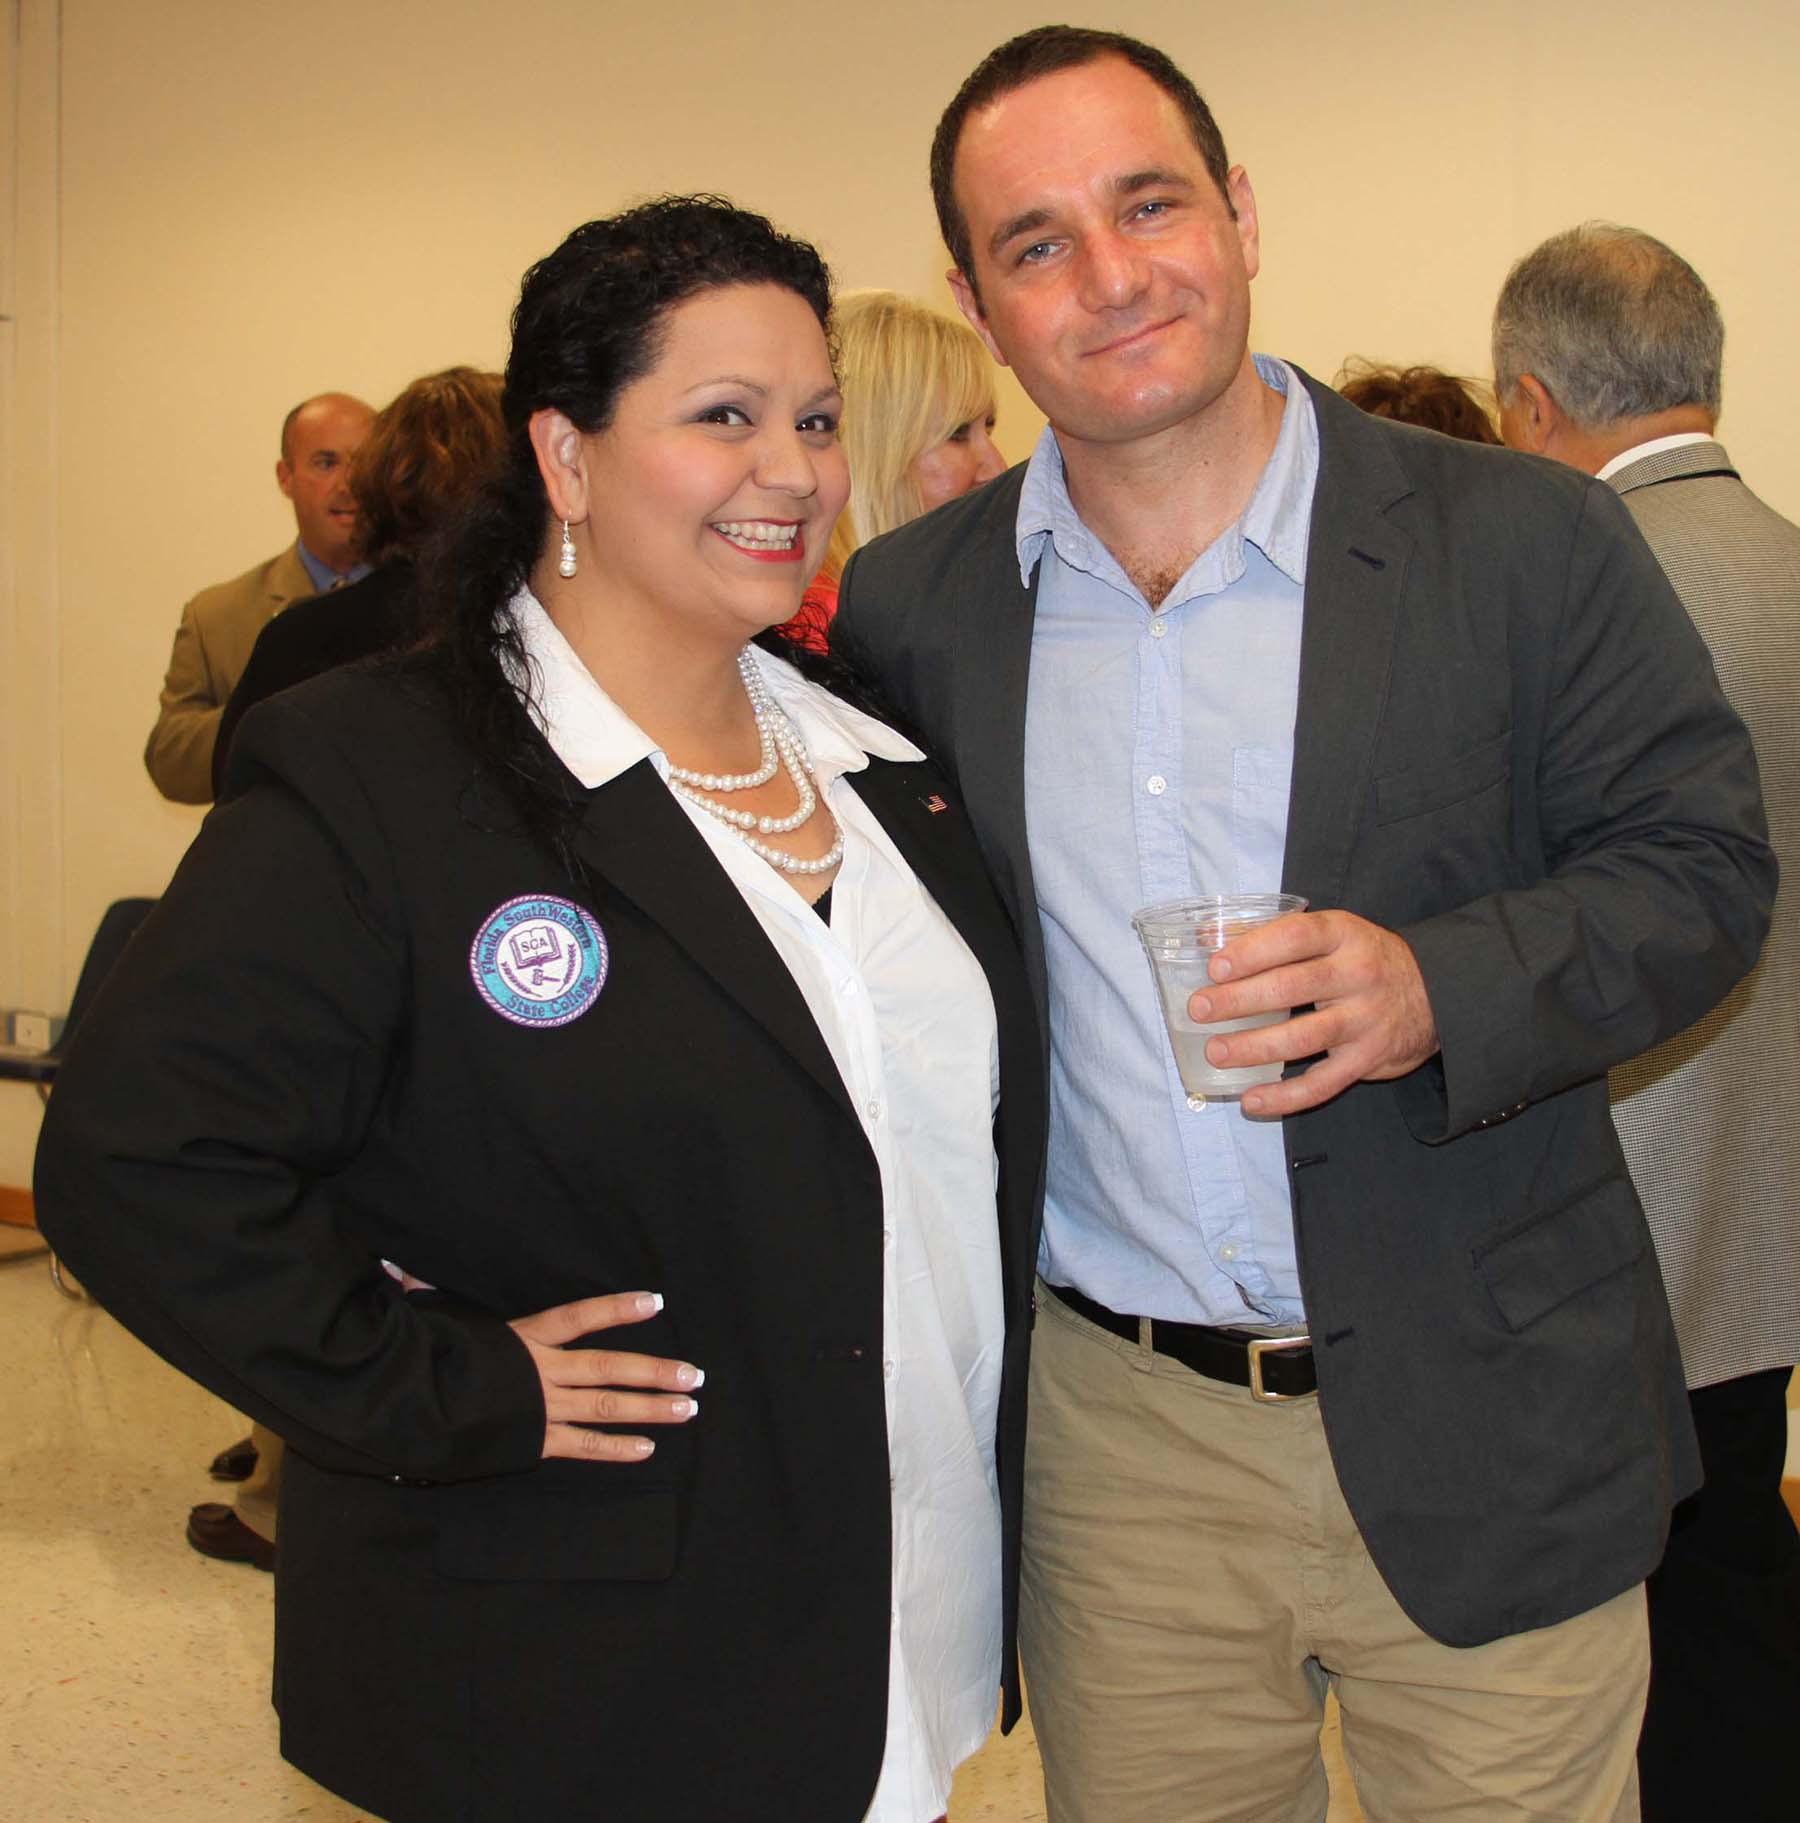 Maria Herrera-Rodriguez, Dr. Christian Parenti